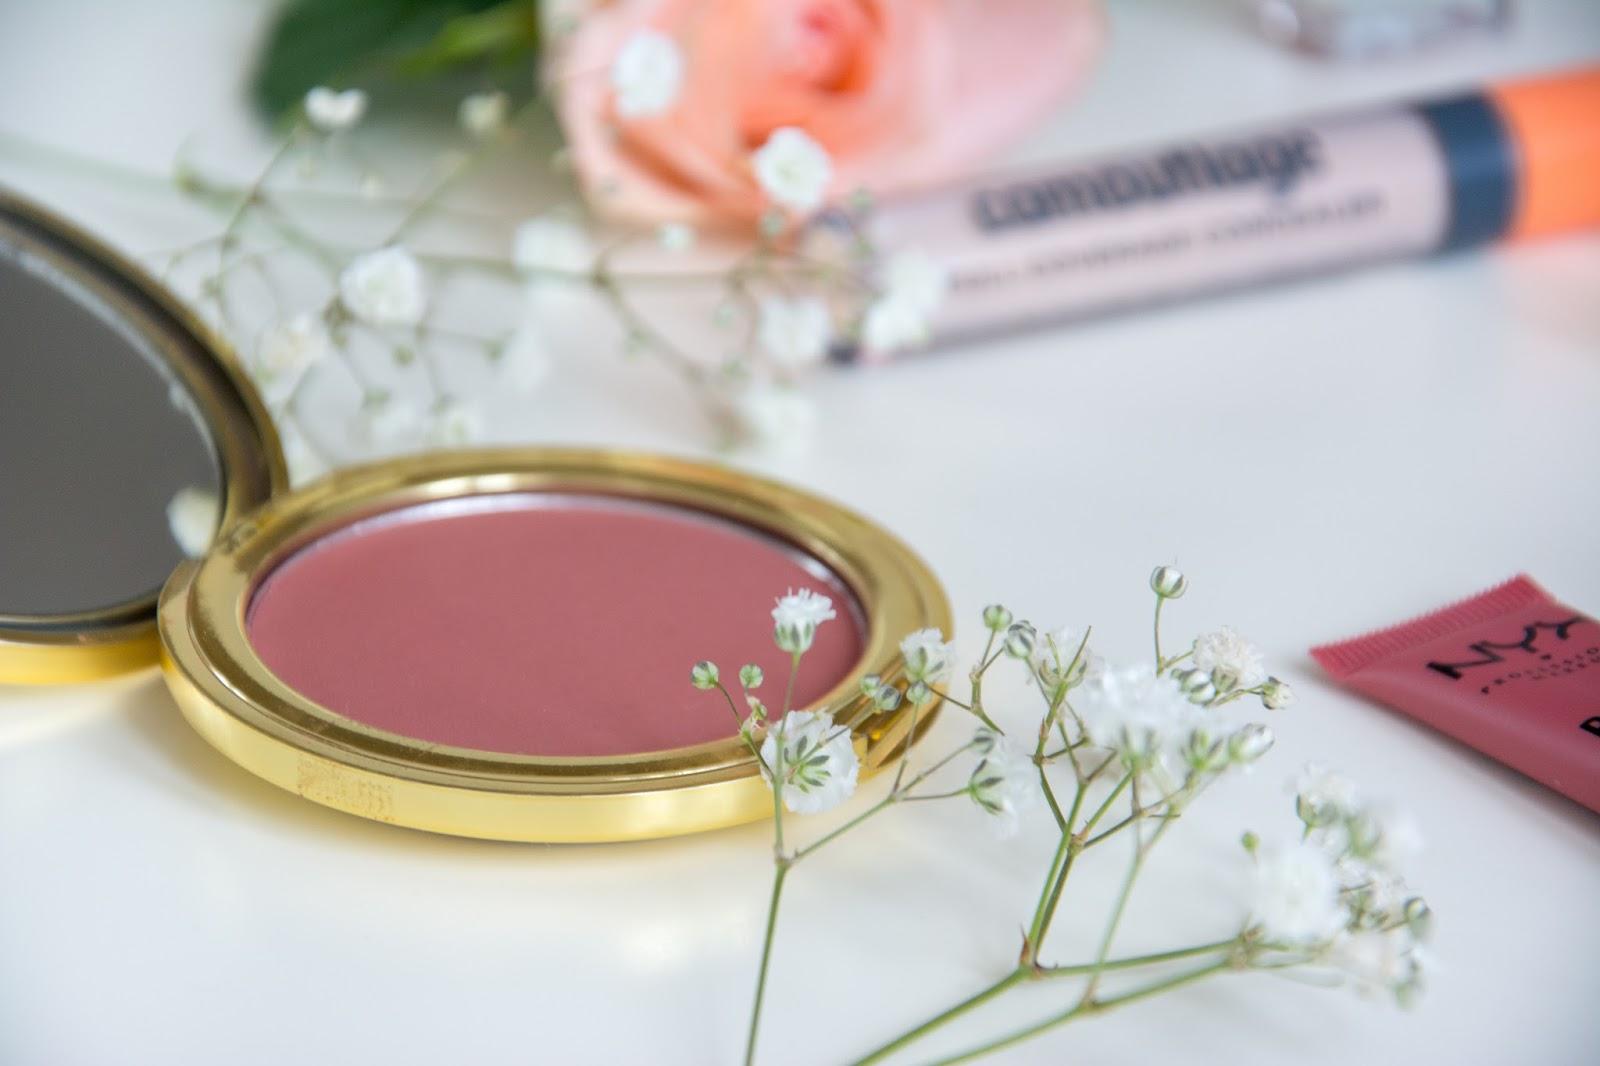 essence camouflage concealer; NYX Powder Puff Lip Lipcream; Primark Blush